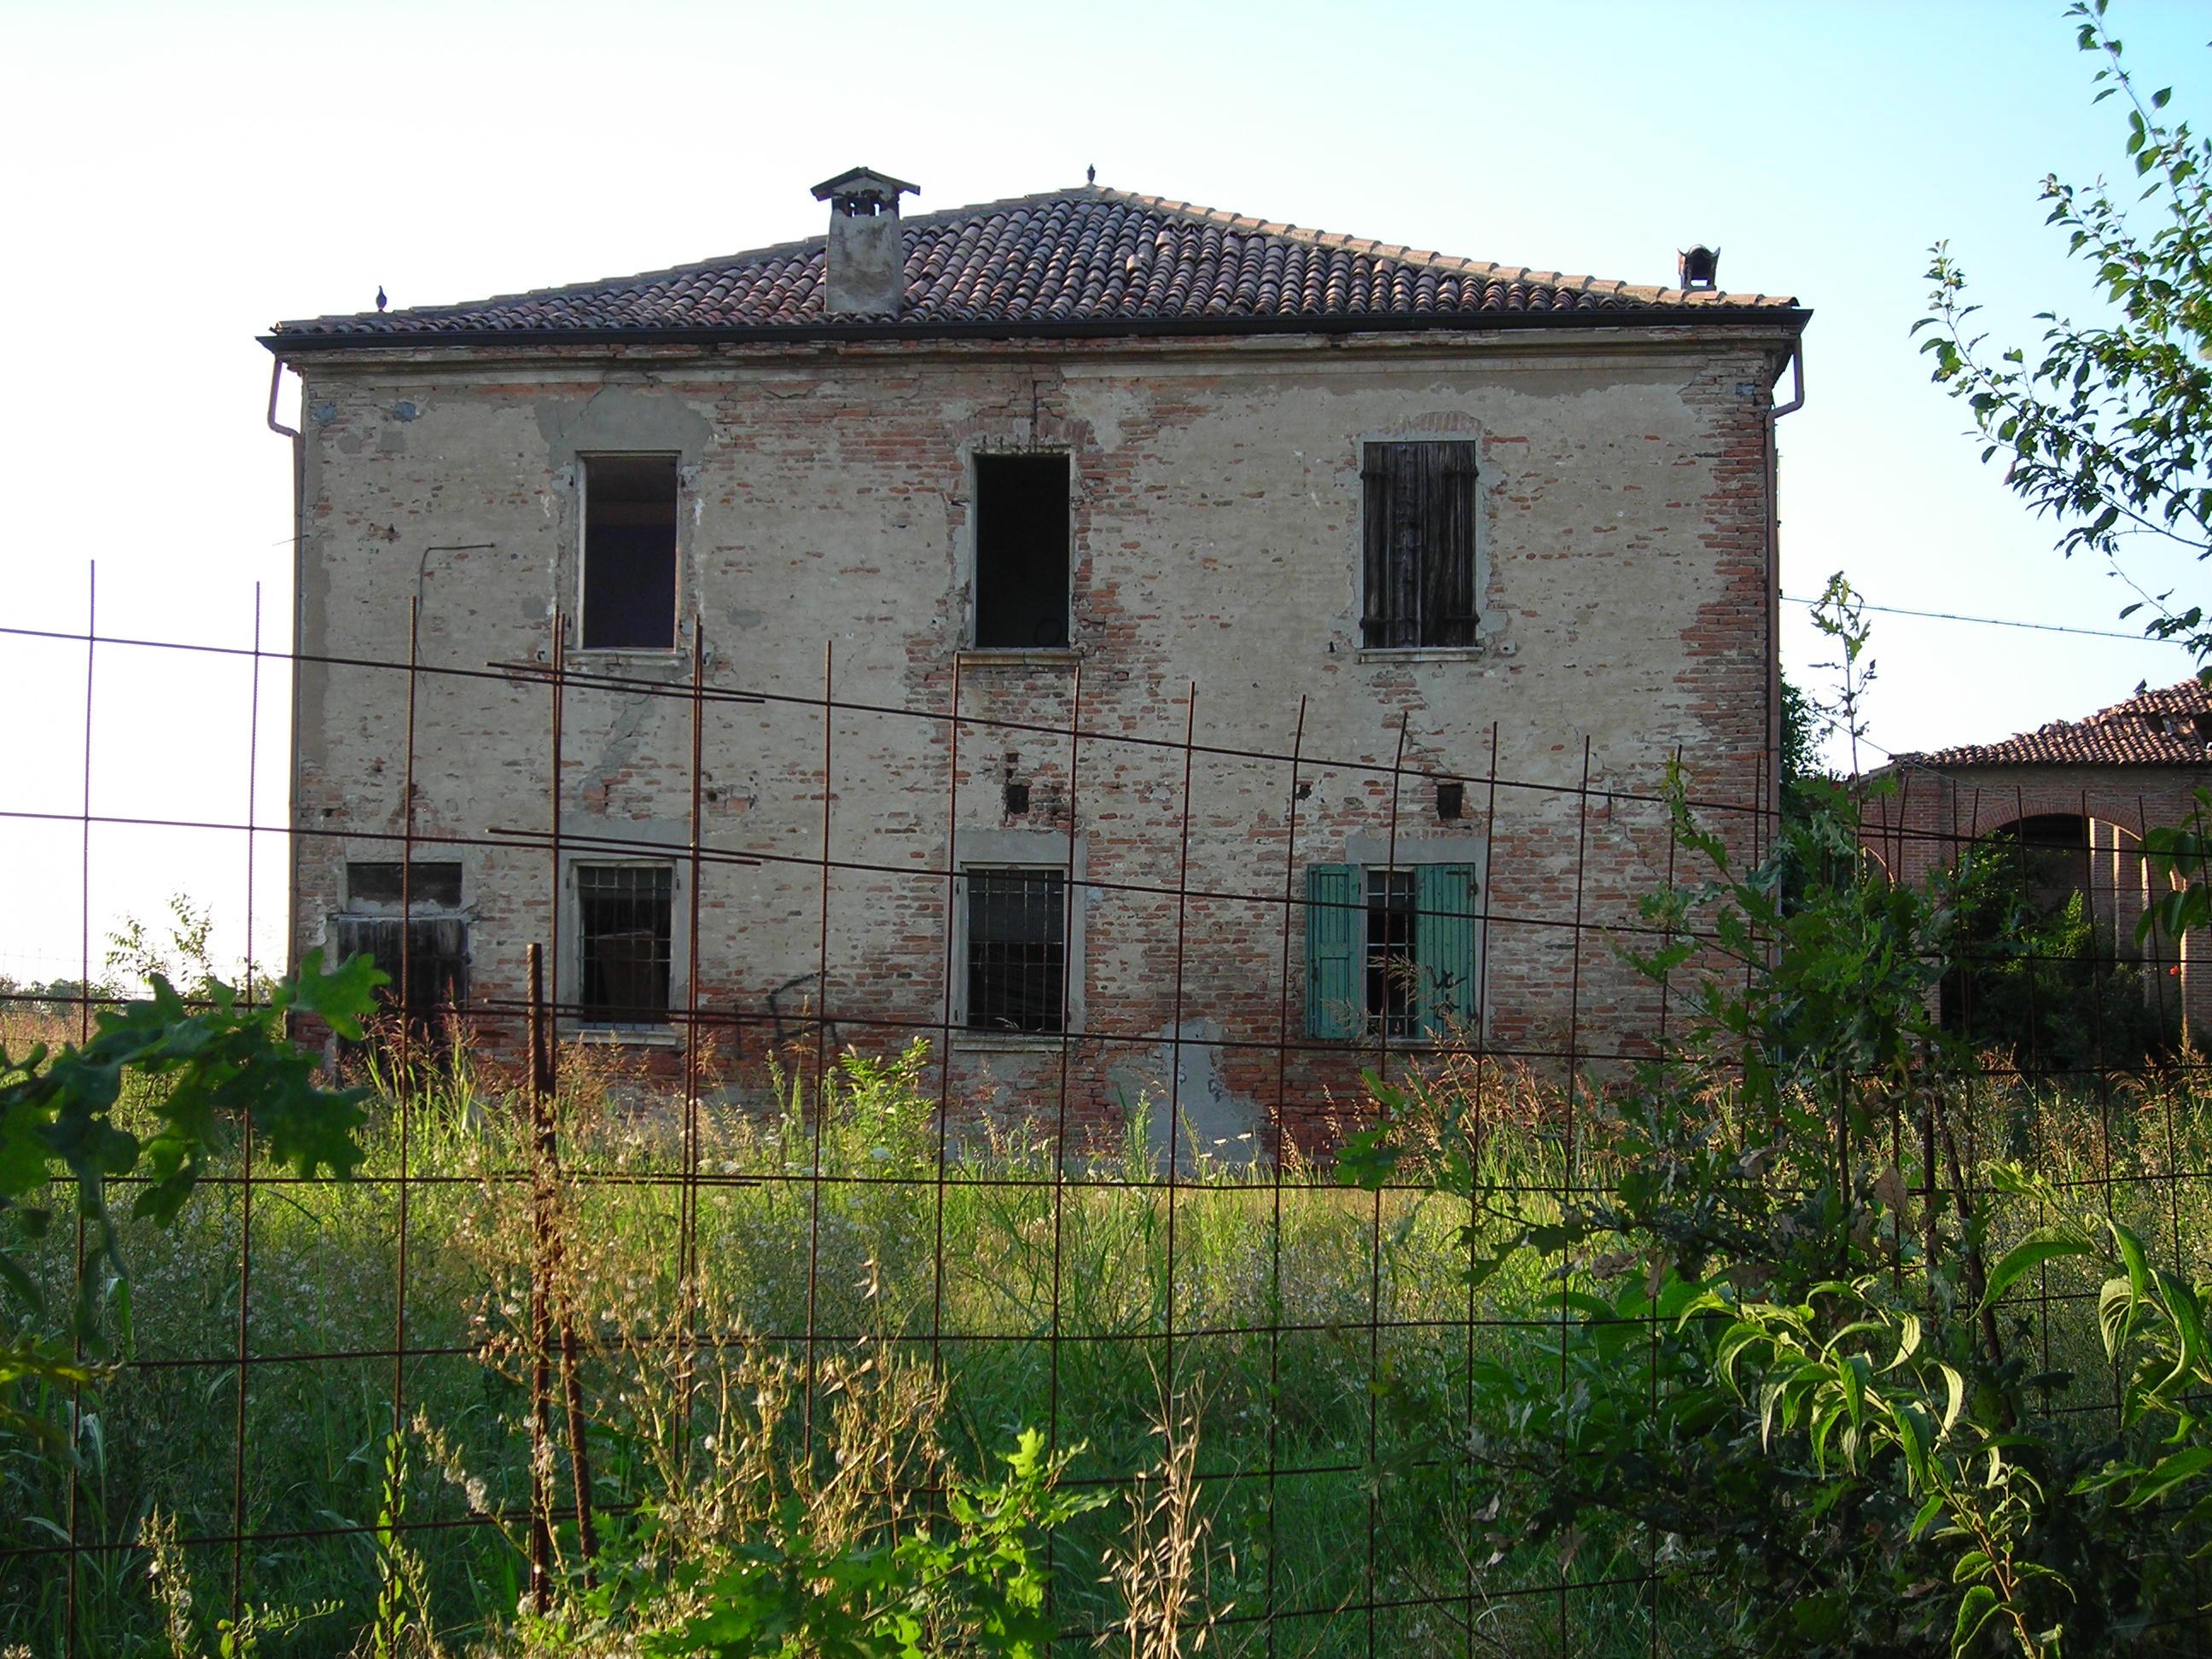 Cohousing a Ferrara, una scelta di sostenibilità sociale e ambientale